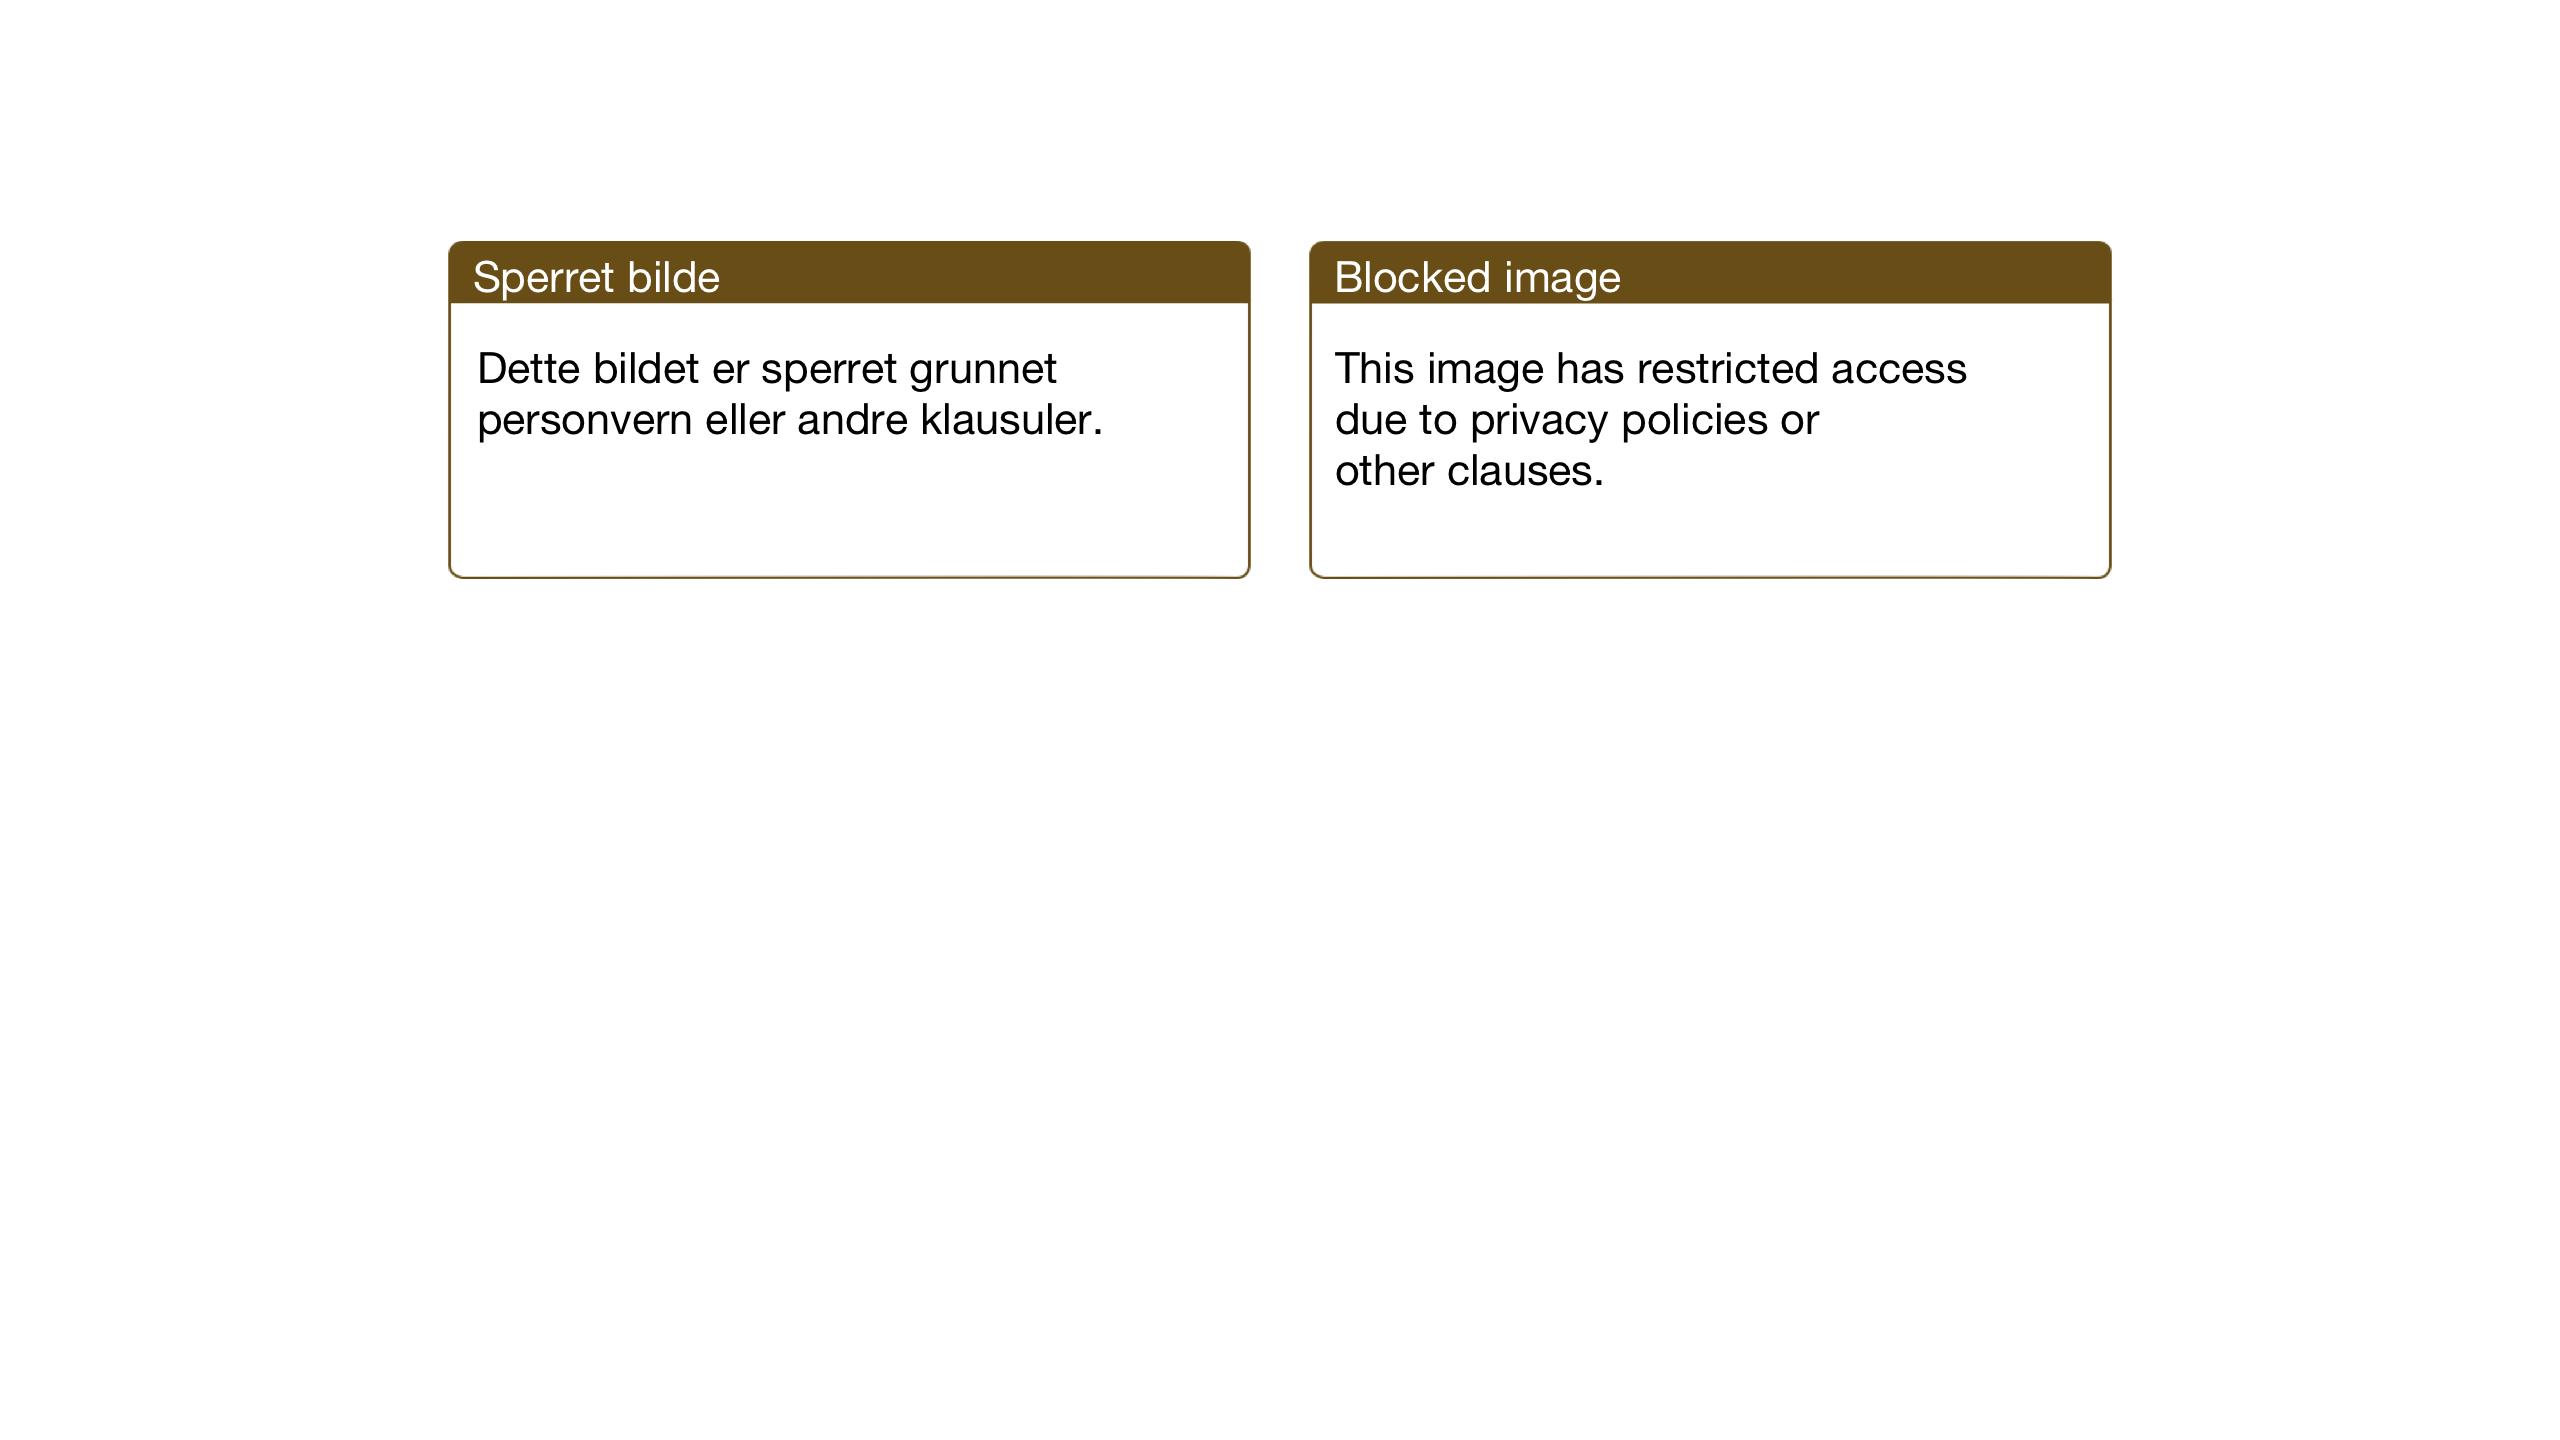 SAB, Domkirken Sokneprestembete, H/Haa: Ministerialbok nr. C 9, 1958-2001, s. 131b-132a